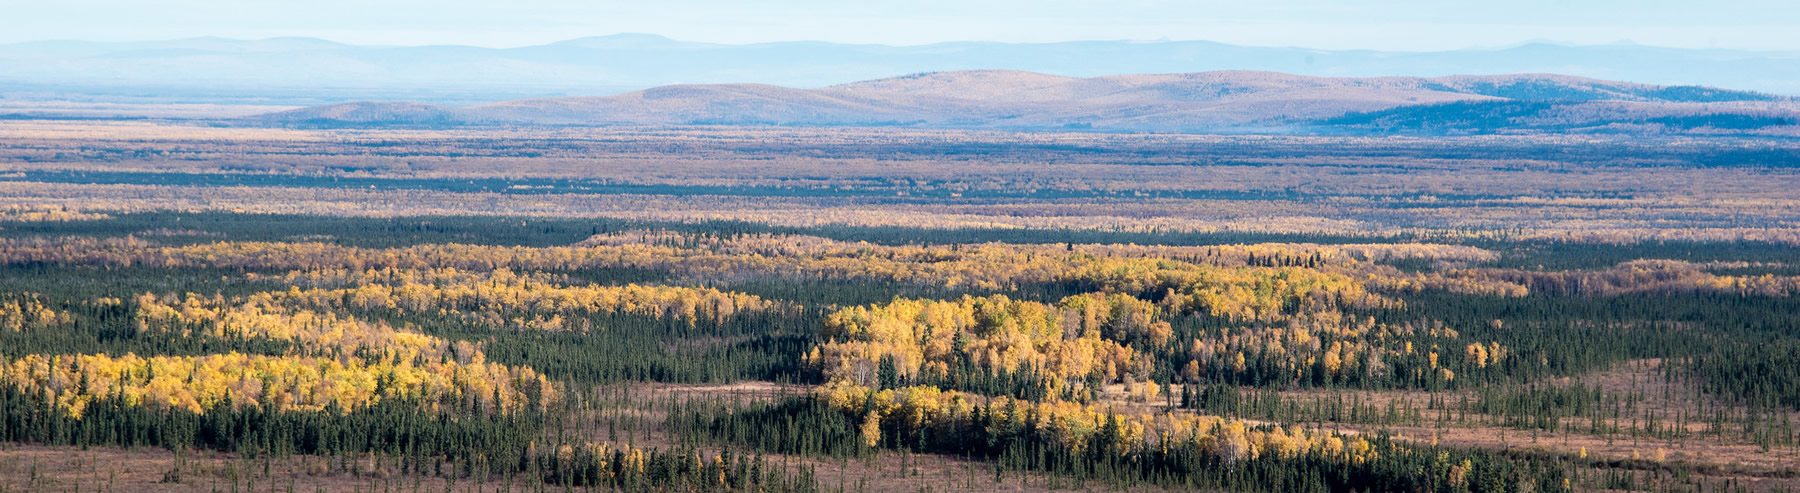 alaska-bear-hunting-banner